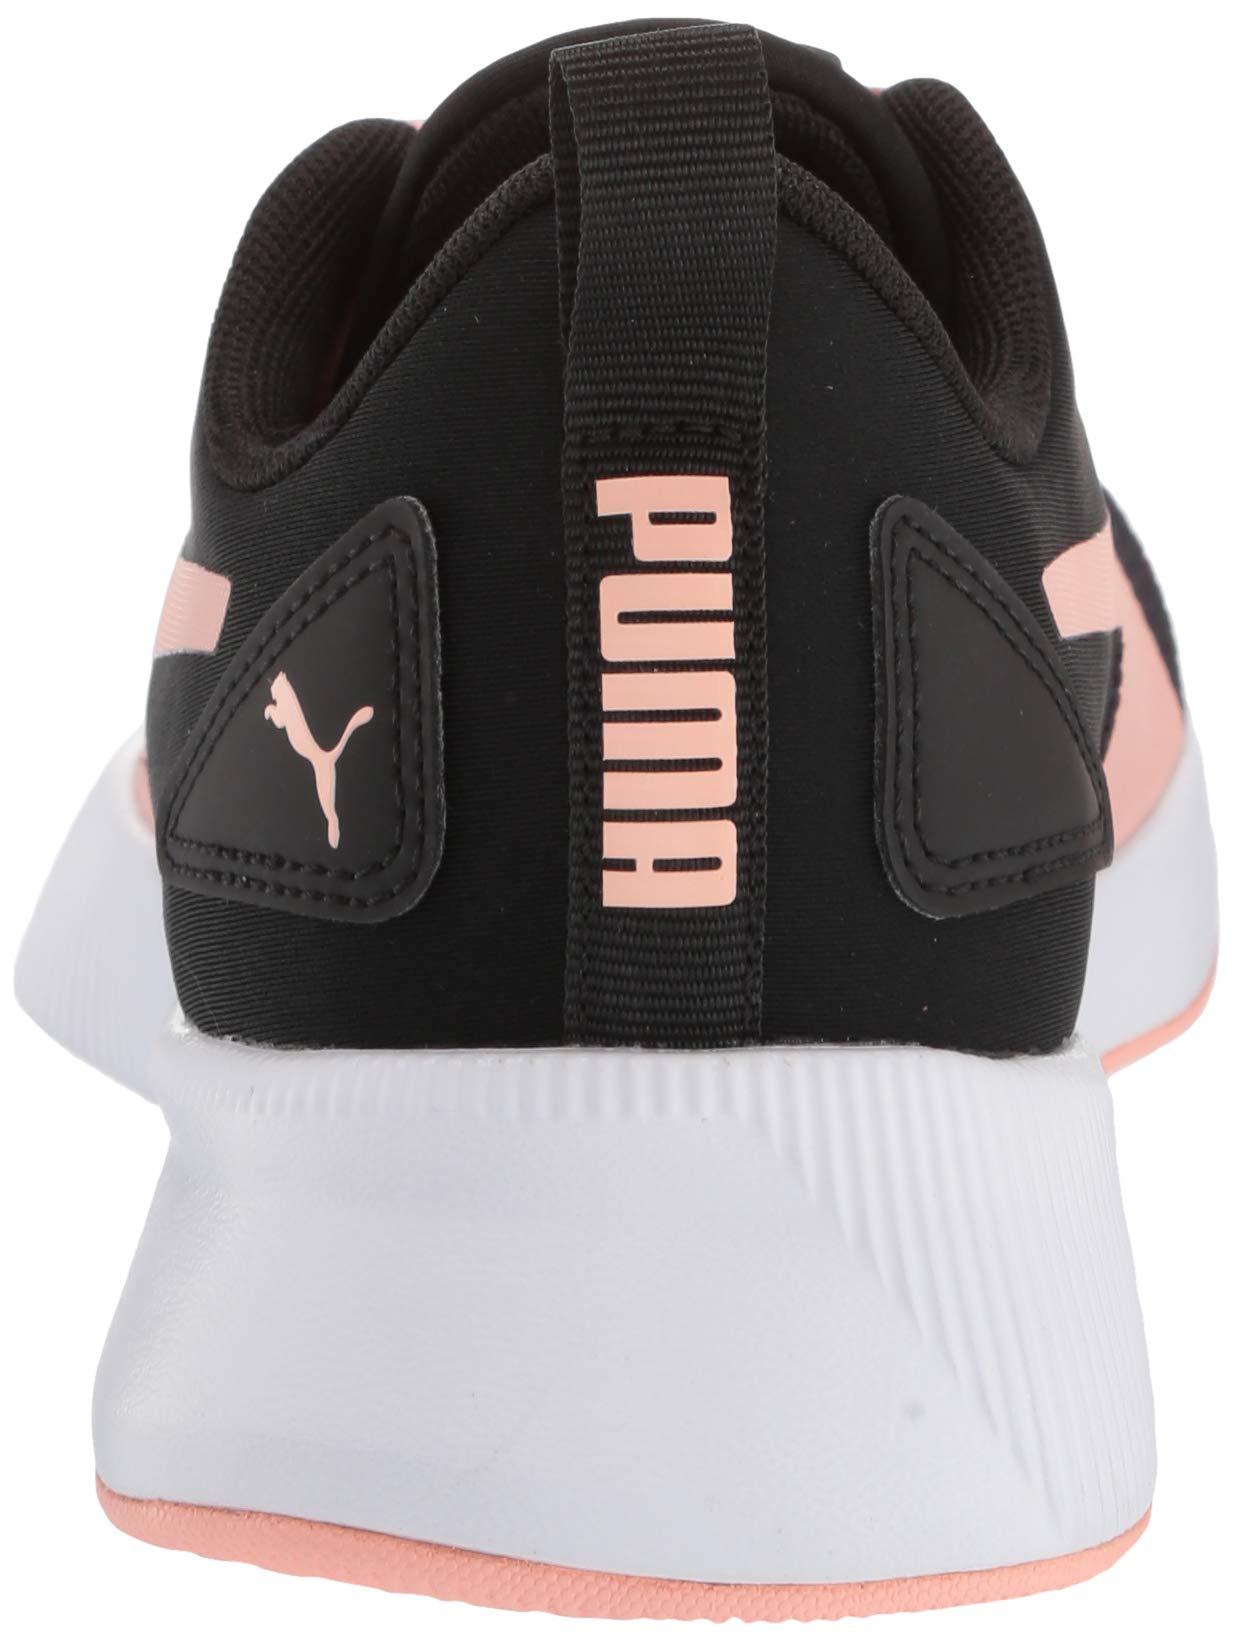 Adidas Nmd Baskets de G27917f4b15d2ecd4758033fe741edf157999d